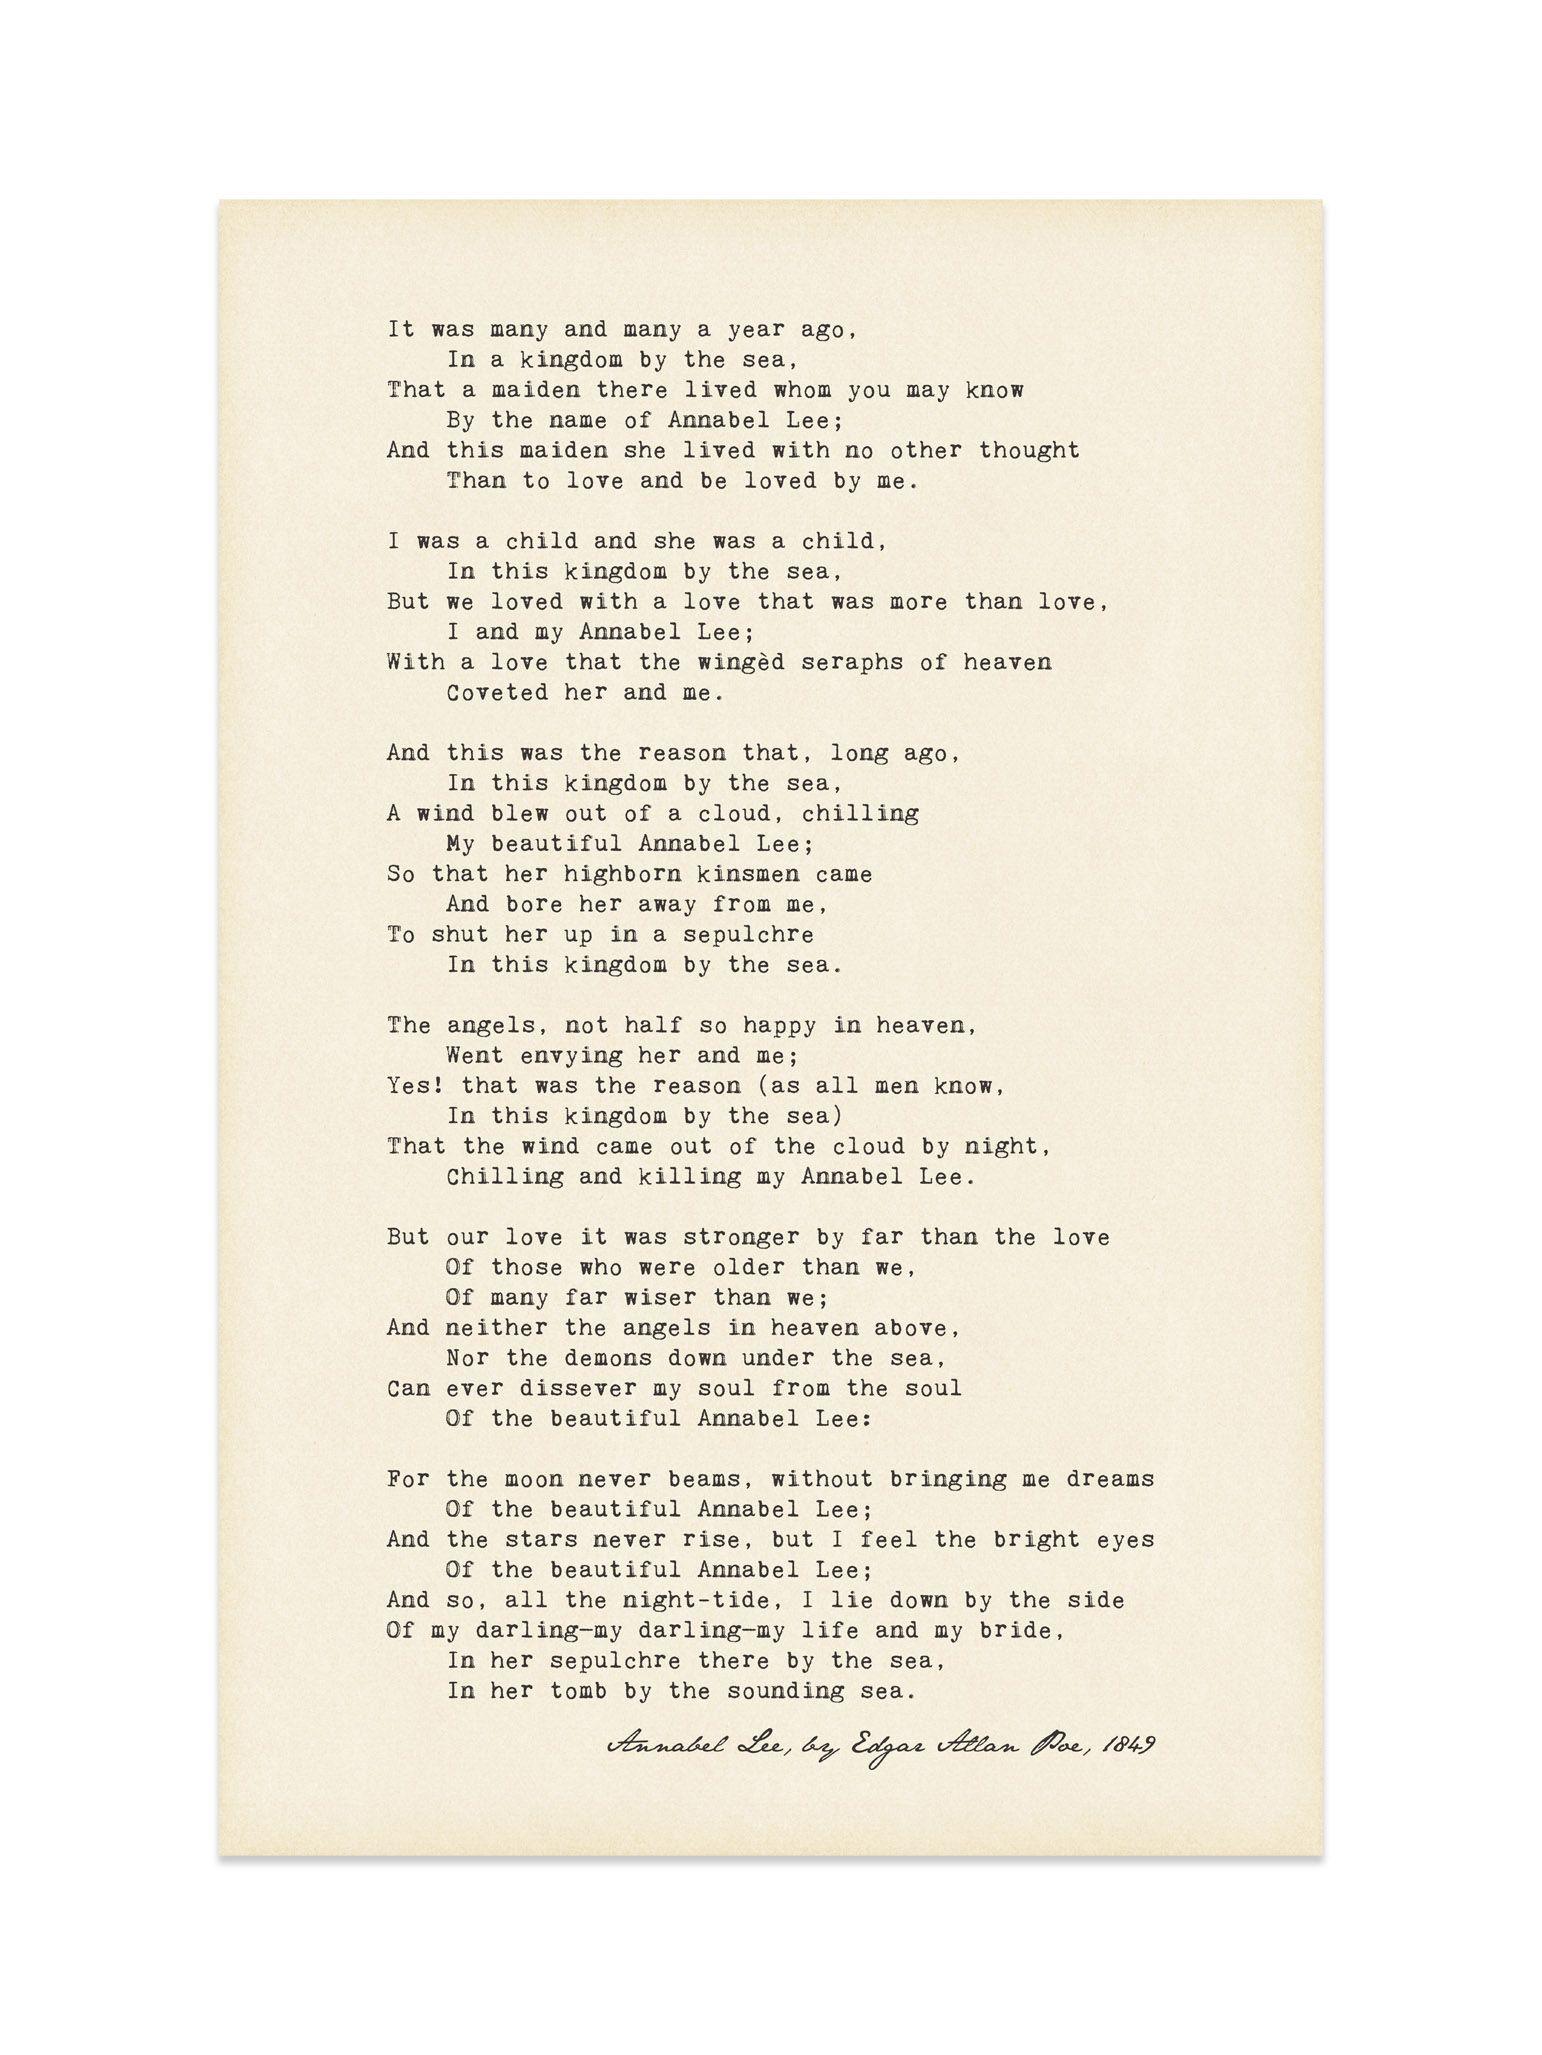 Annabel Lee Poem Poster Edgar Allan Poe Etsy Poems Robert Frost Poems Annabel Lee